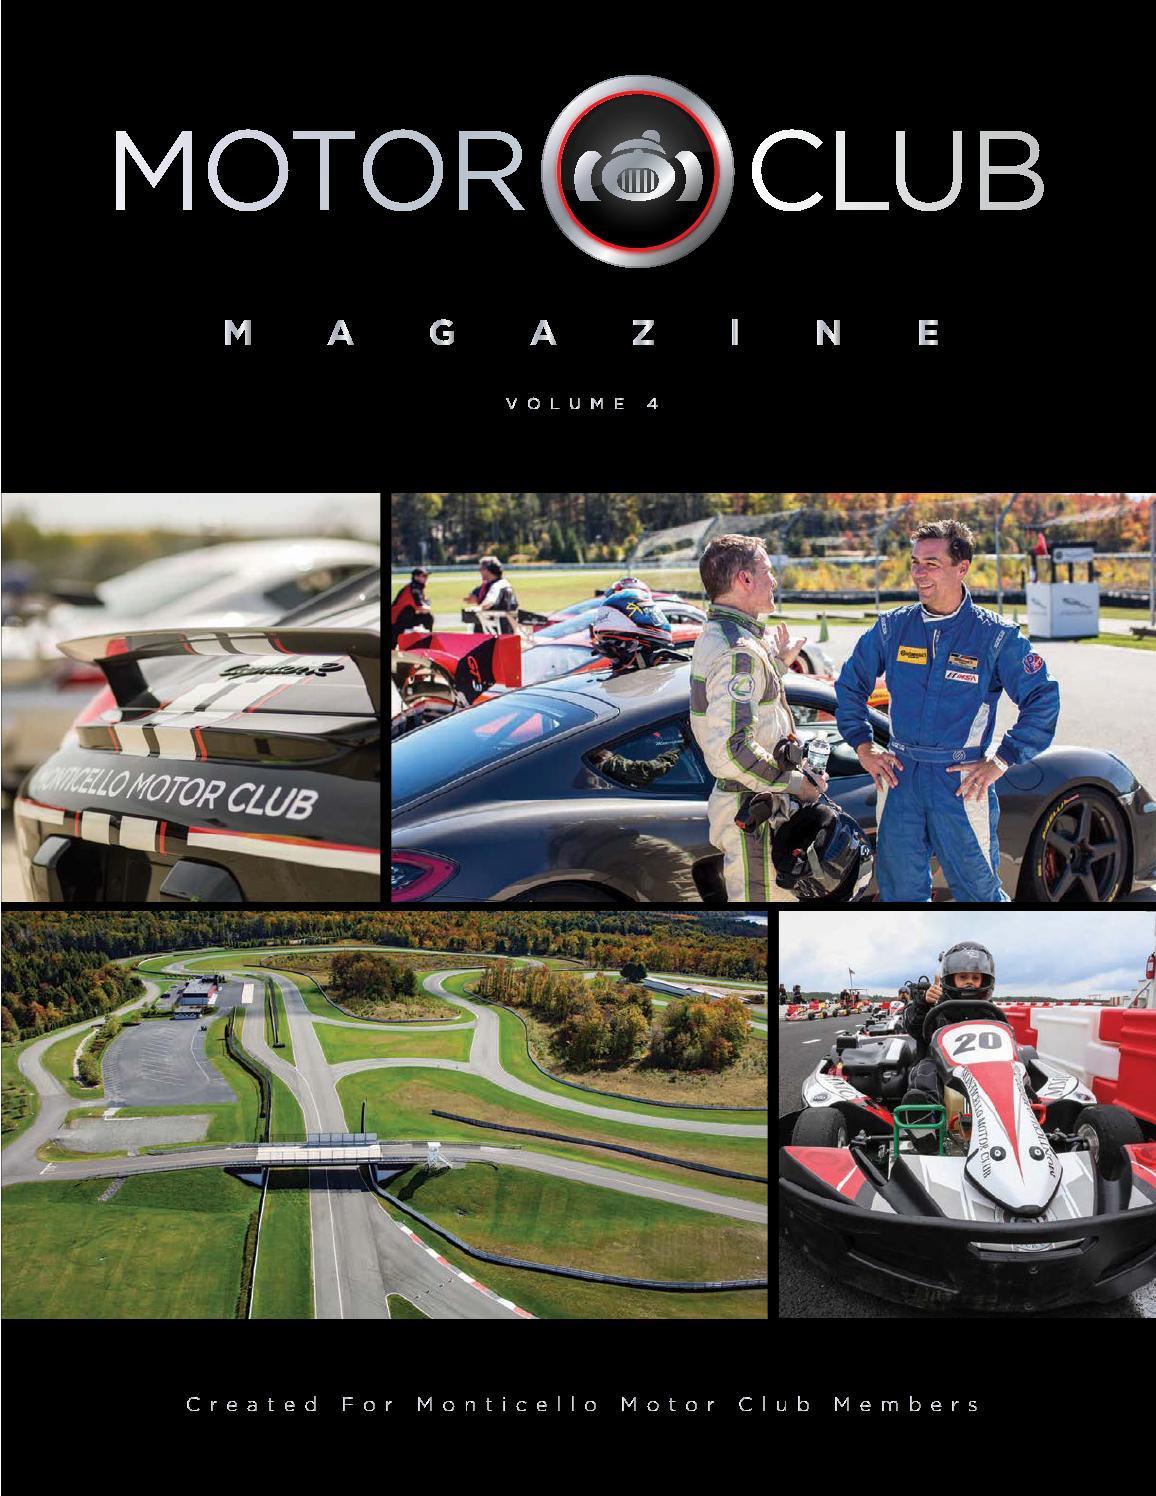 Motor Club Magazine Volume 4 By Monticello Motor Club